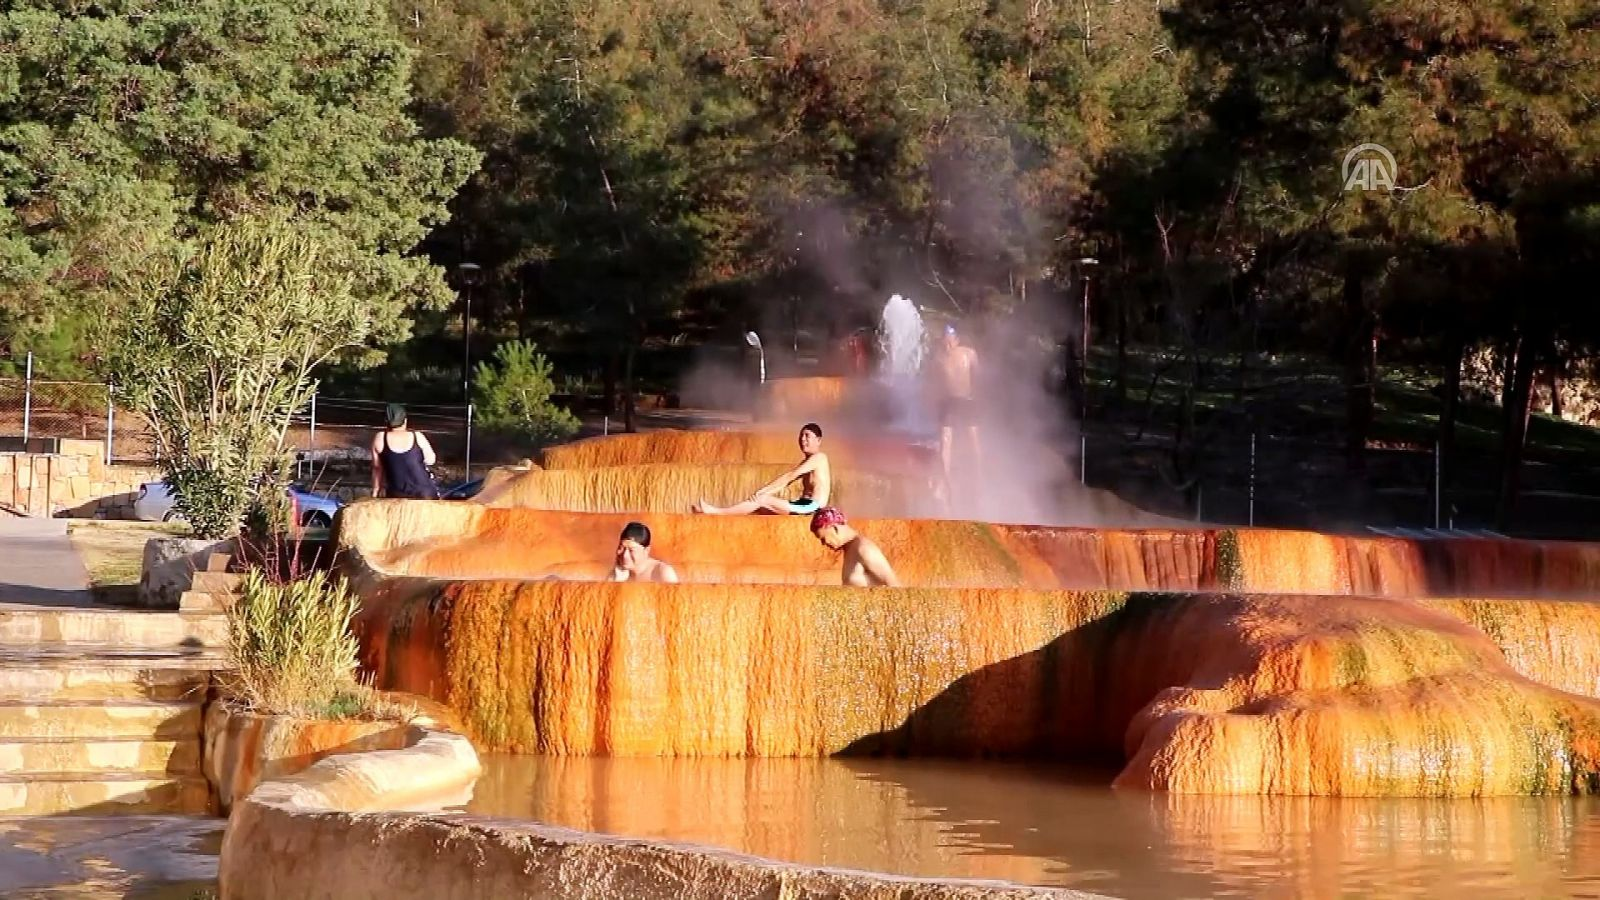 Şifalı Kırmızı Su: Karahayıt Kaplıcası